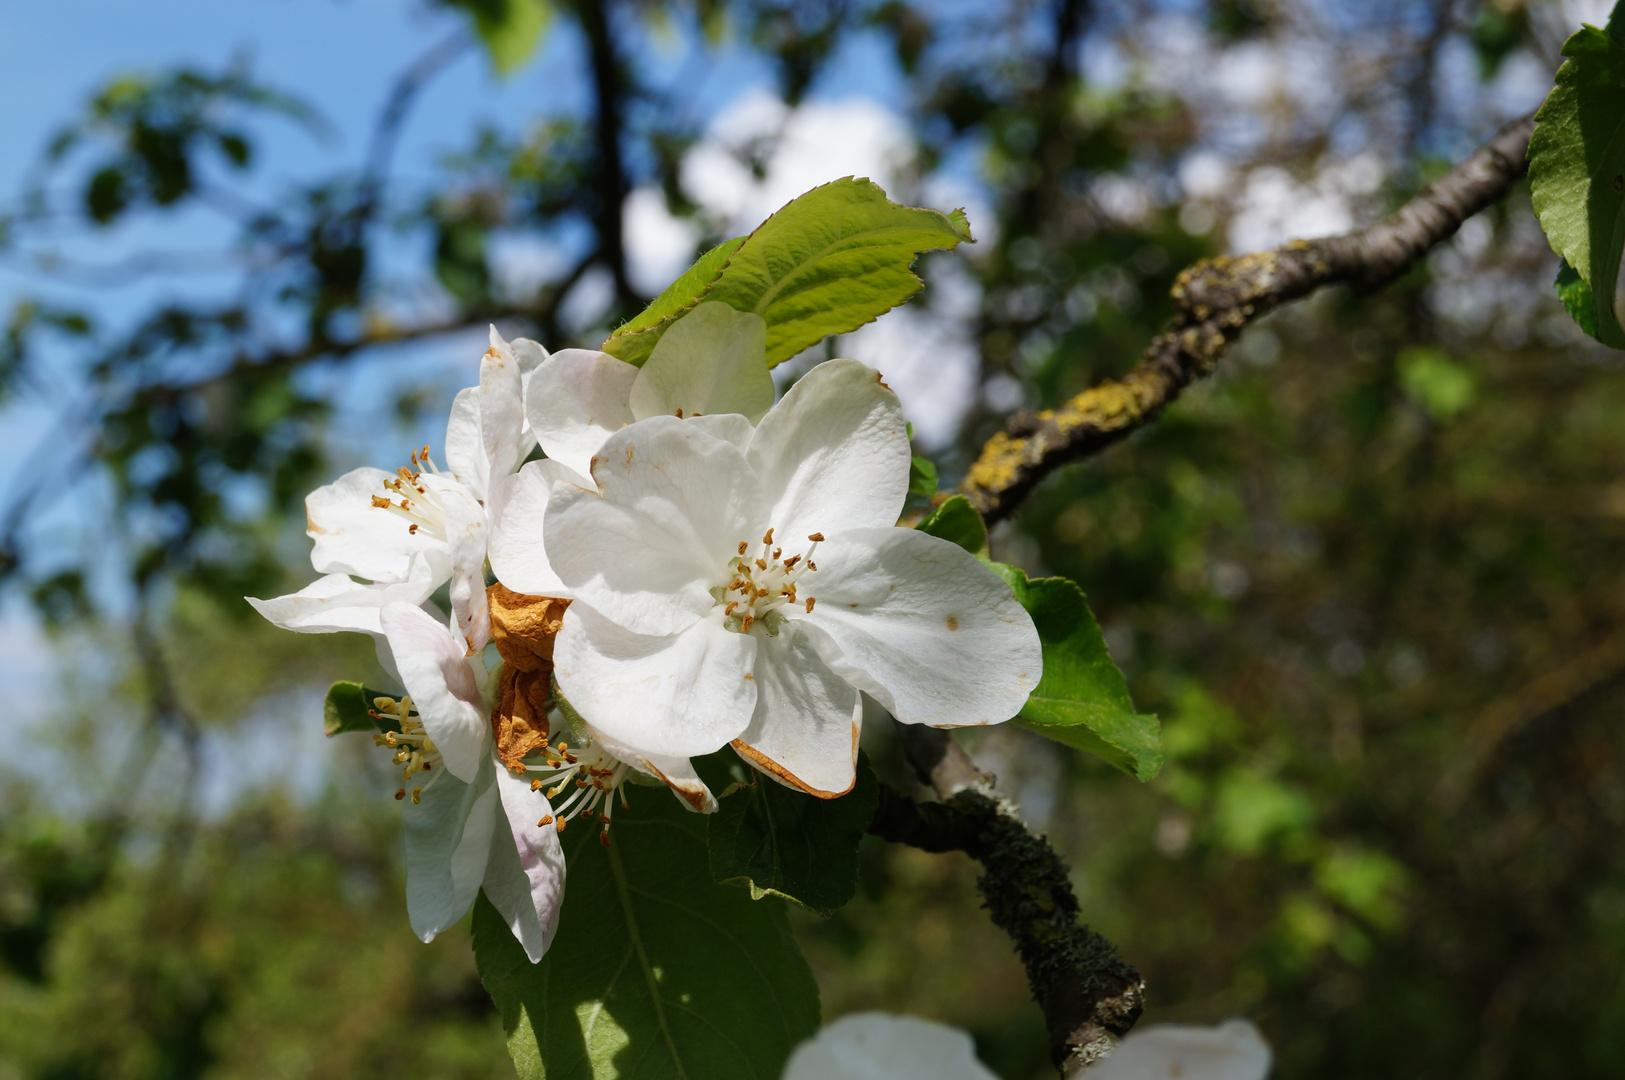 Apfelbaumblüte #3